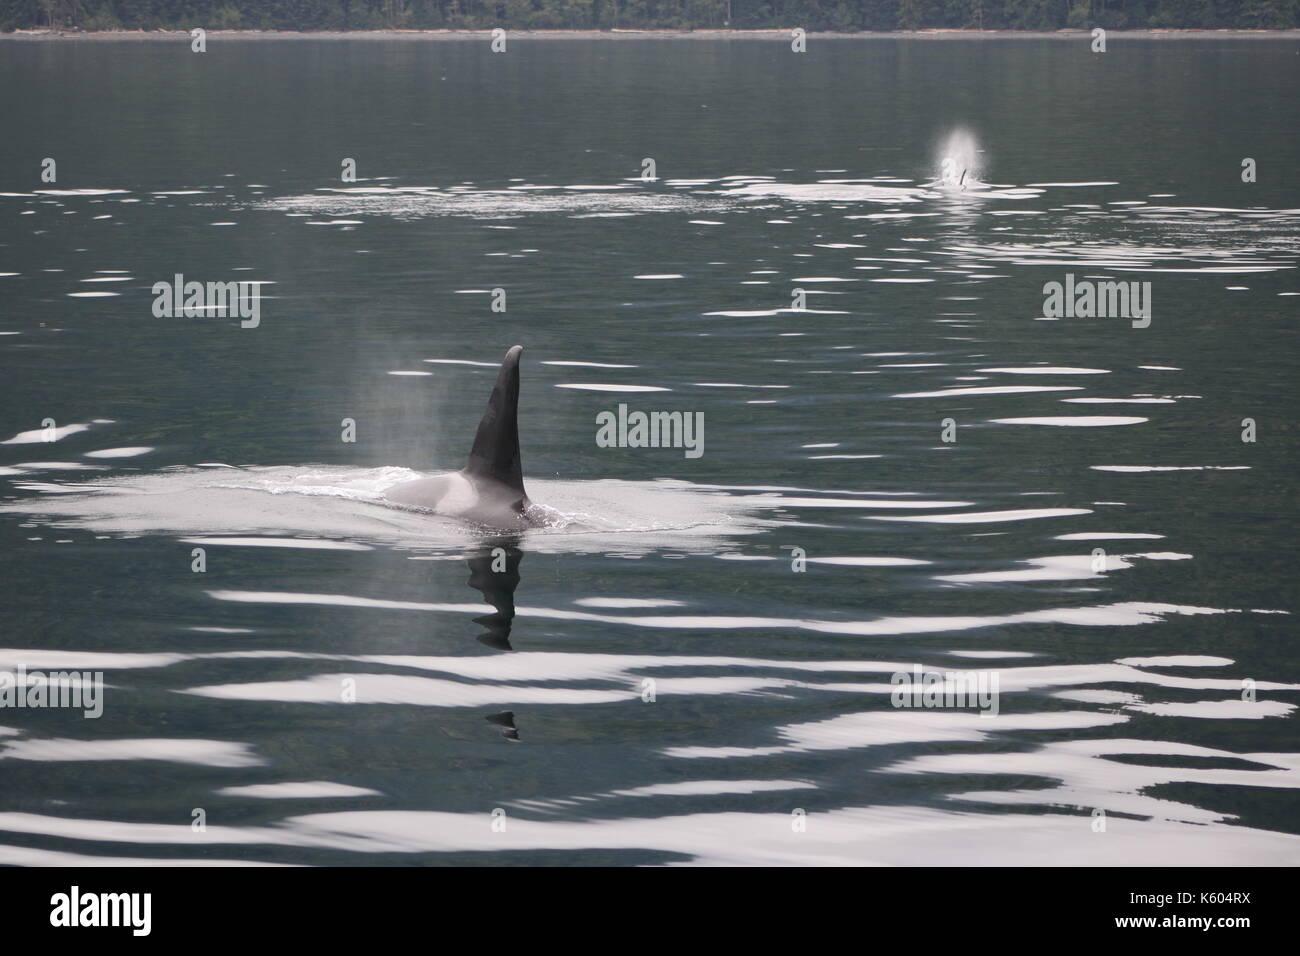 Orcas in British Columbia - Stock Image